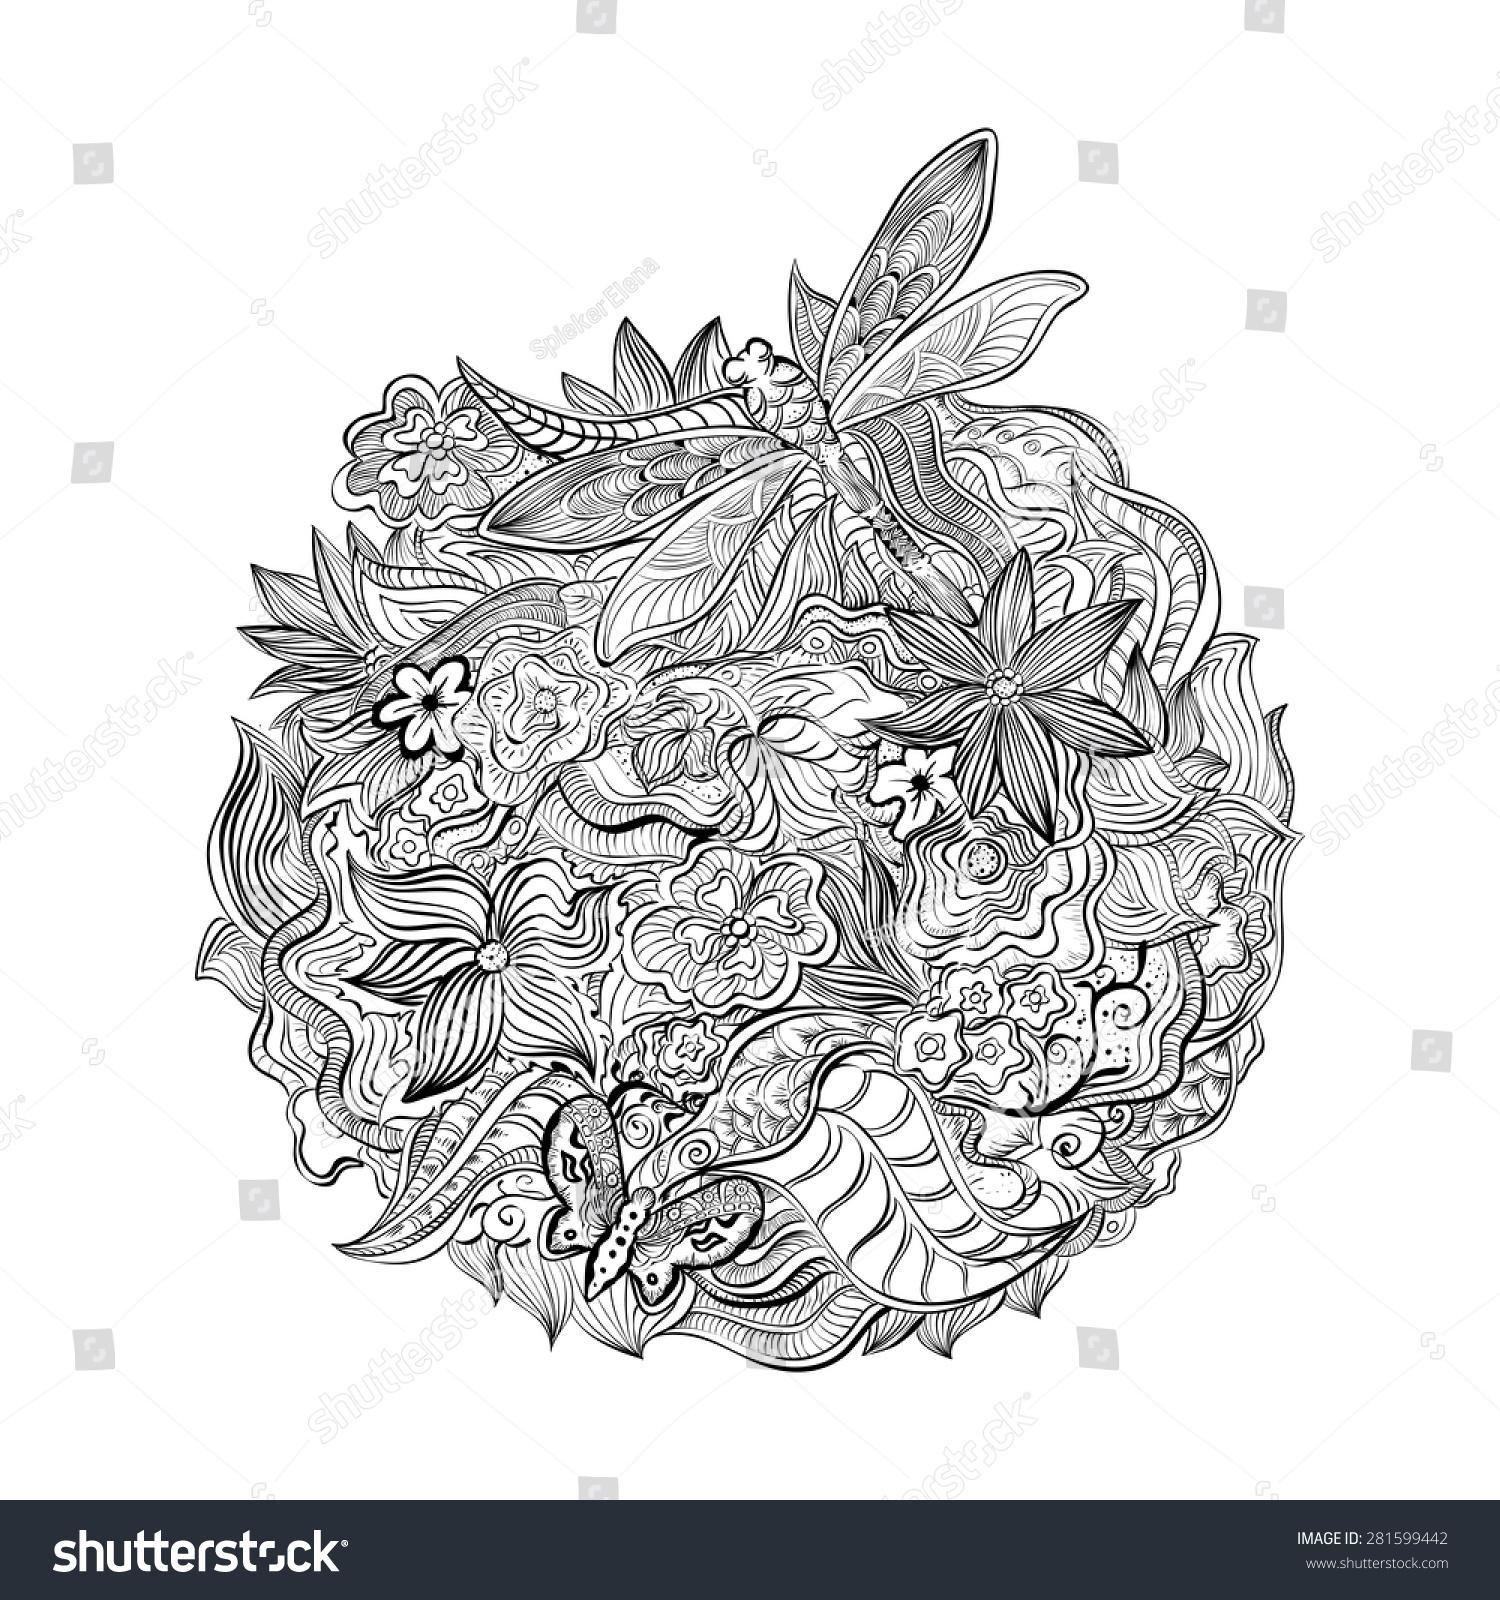 Henna Paisley Mehndi Abstract Floral Vector Stock Vector Royalty